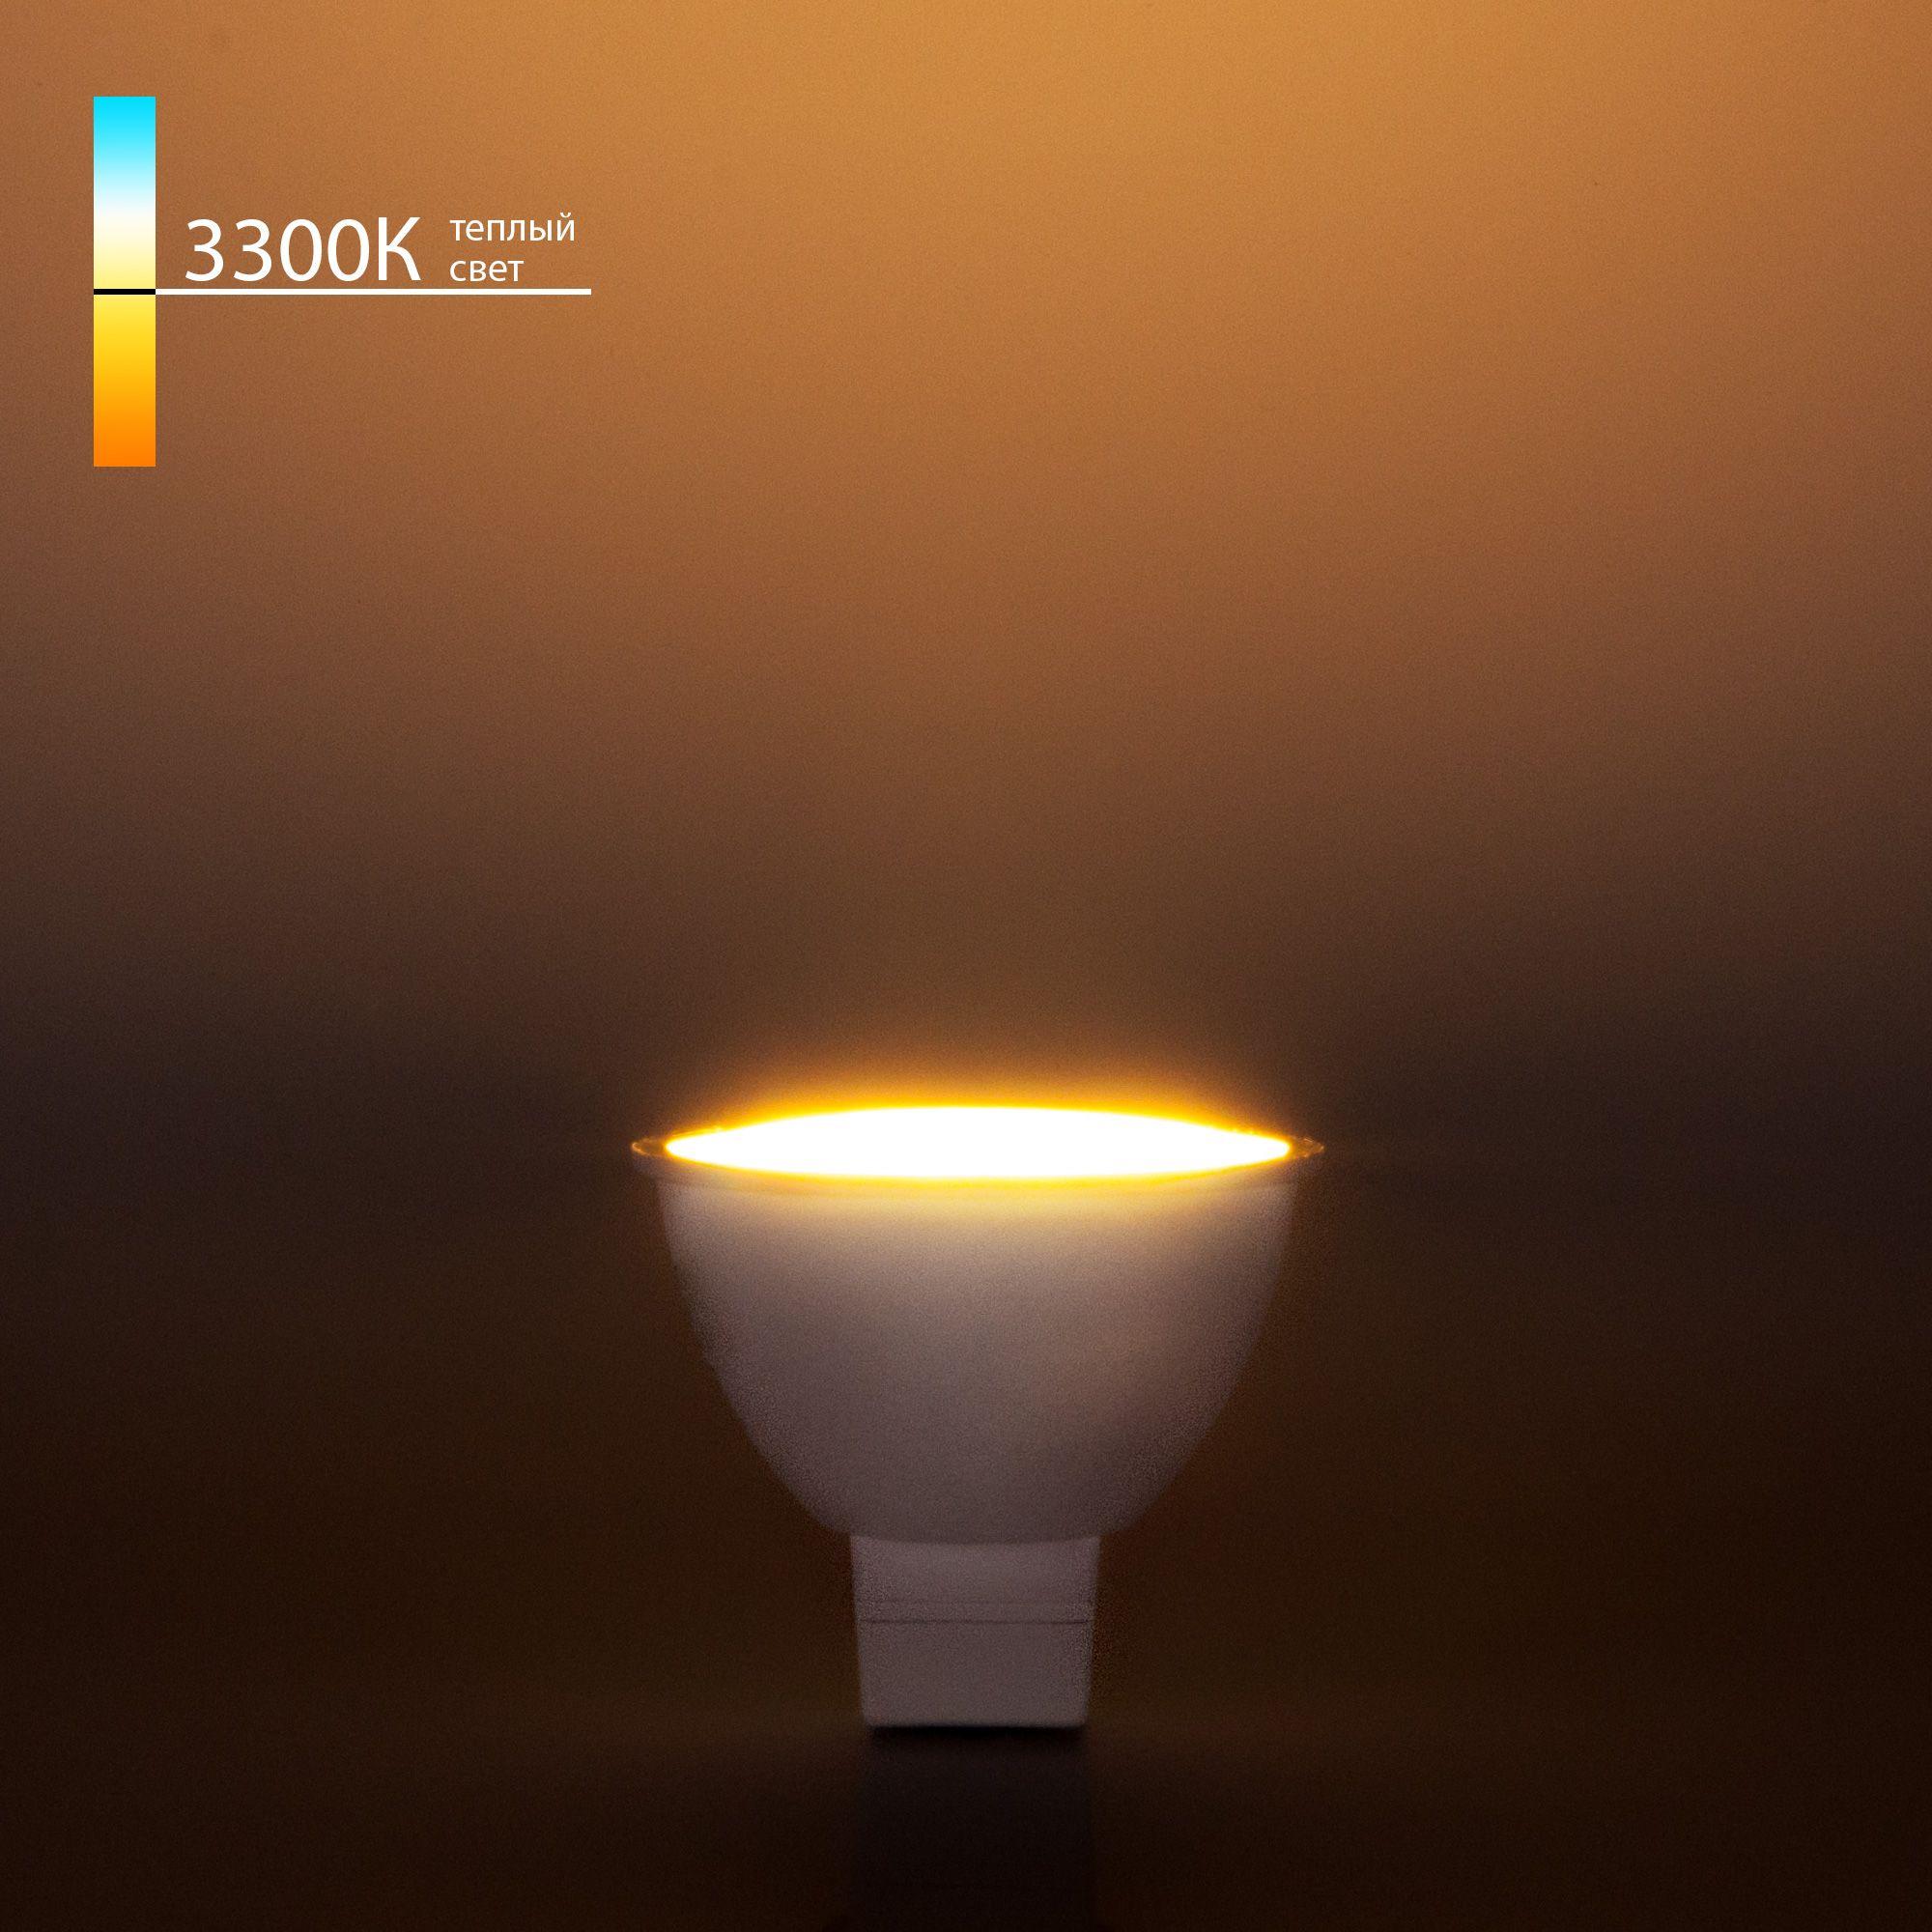 Светодиодная лампа JCDR01 9W 220V 3300K